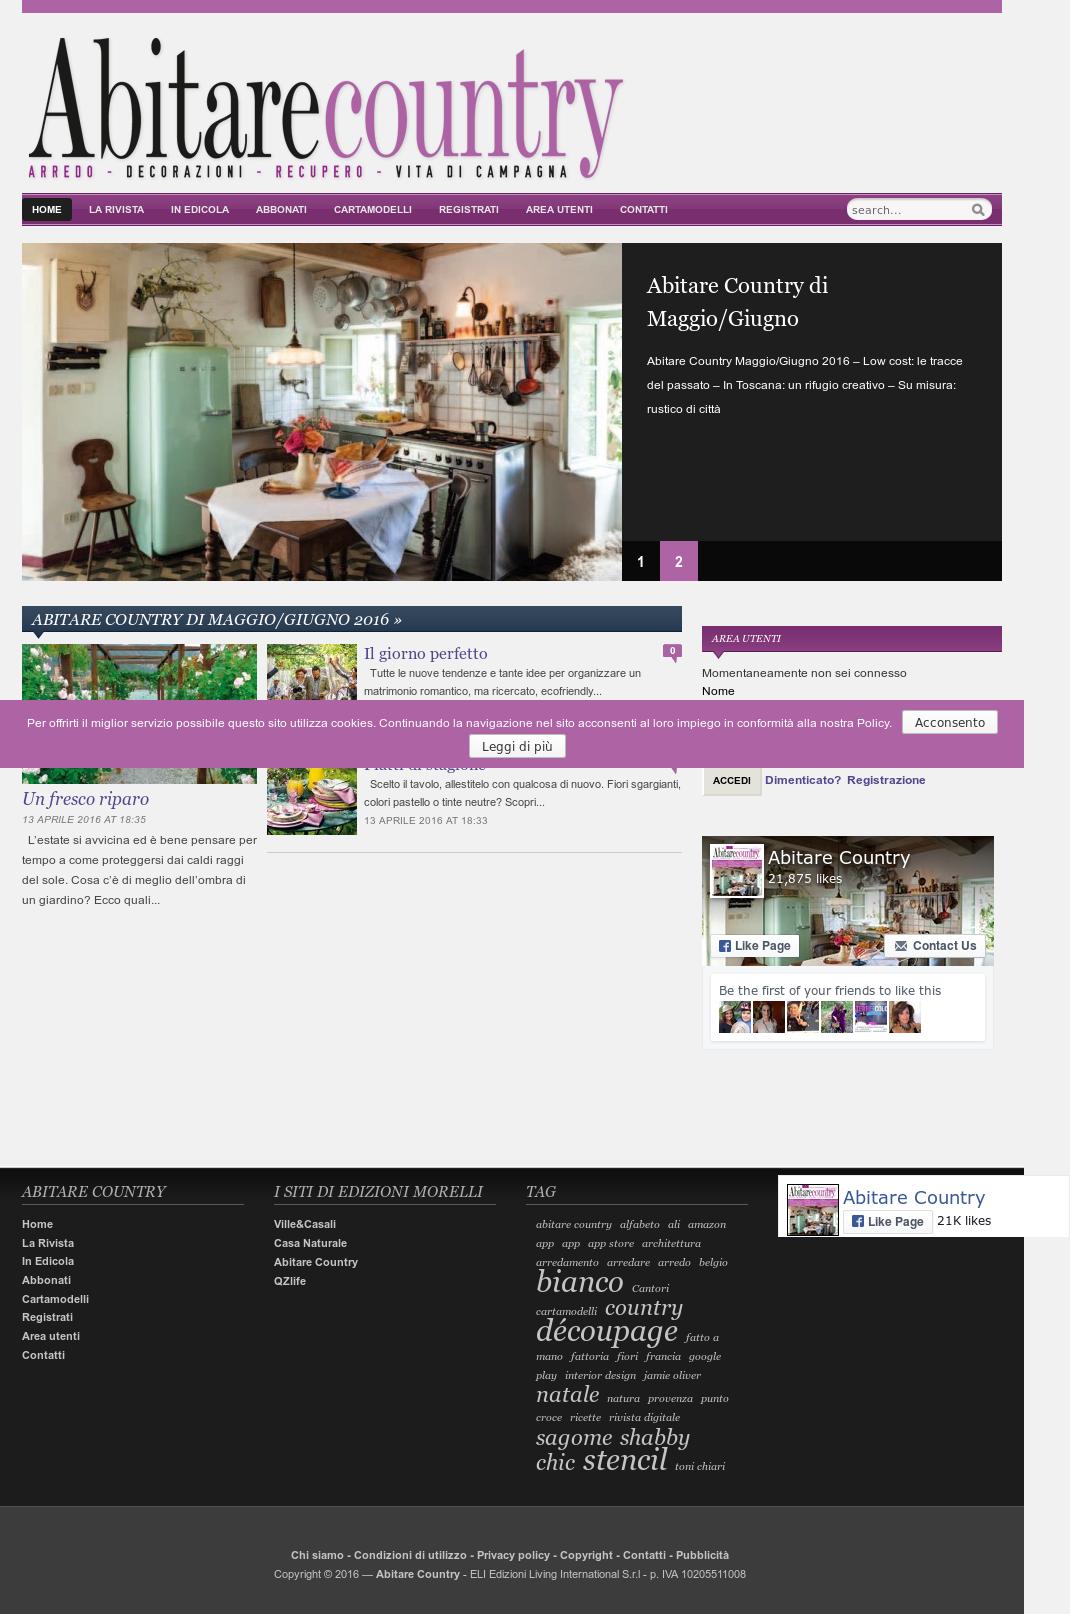 Arredamento Shabby Toscana abitare country competitors, revenue and employees - owler